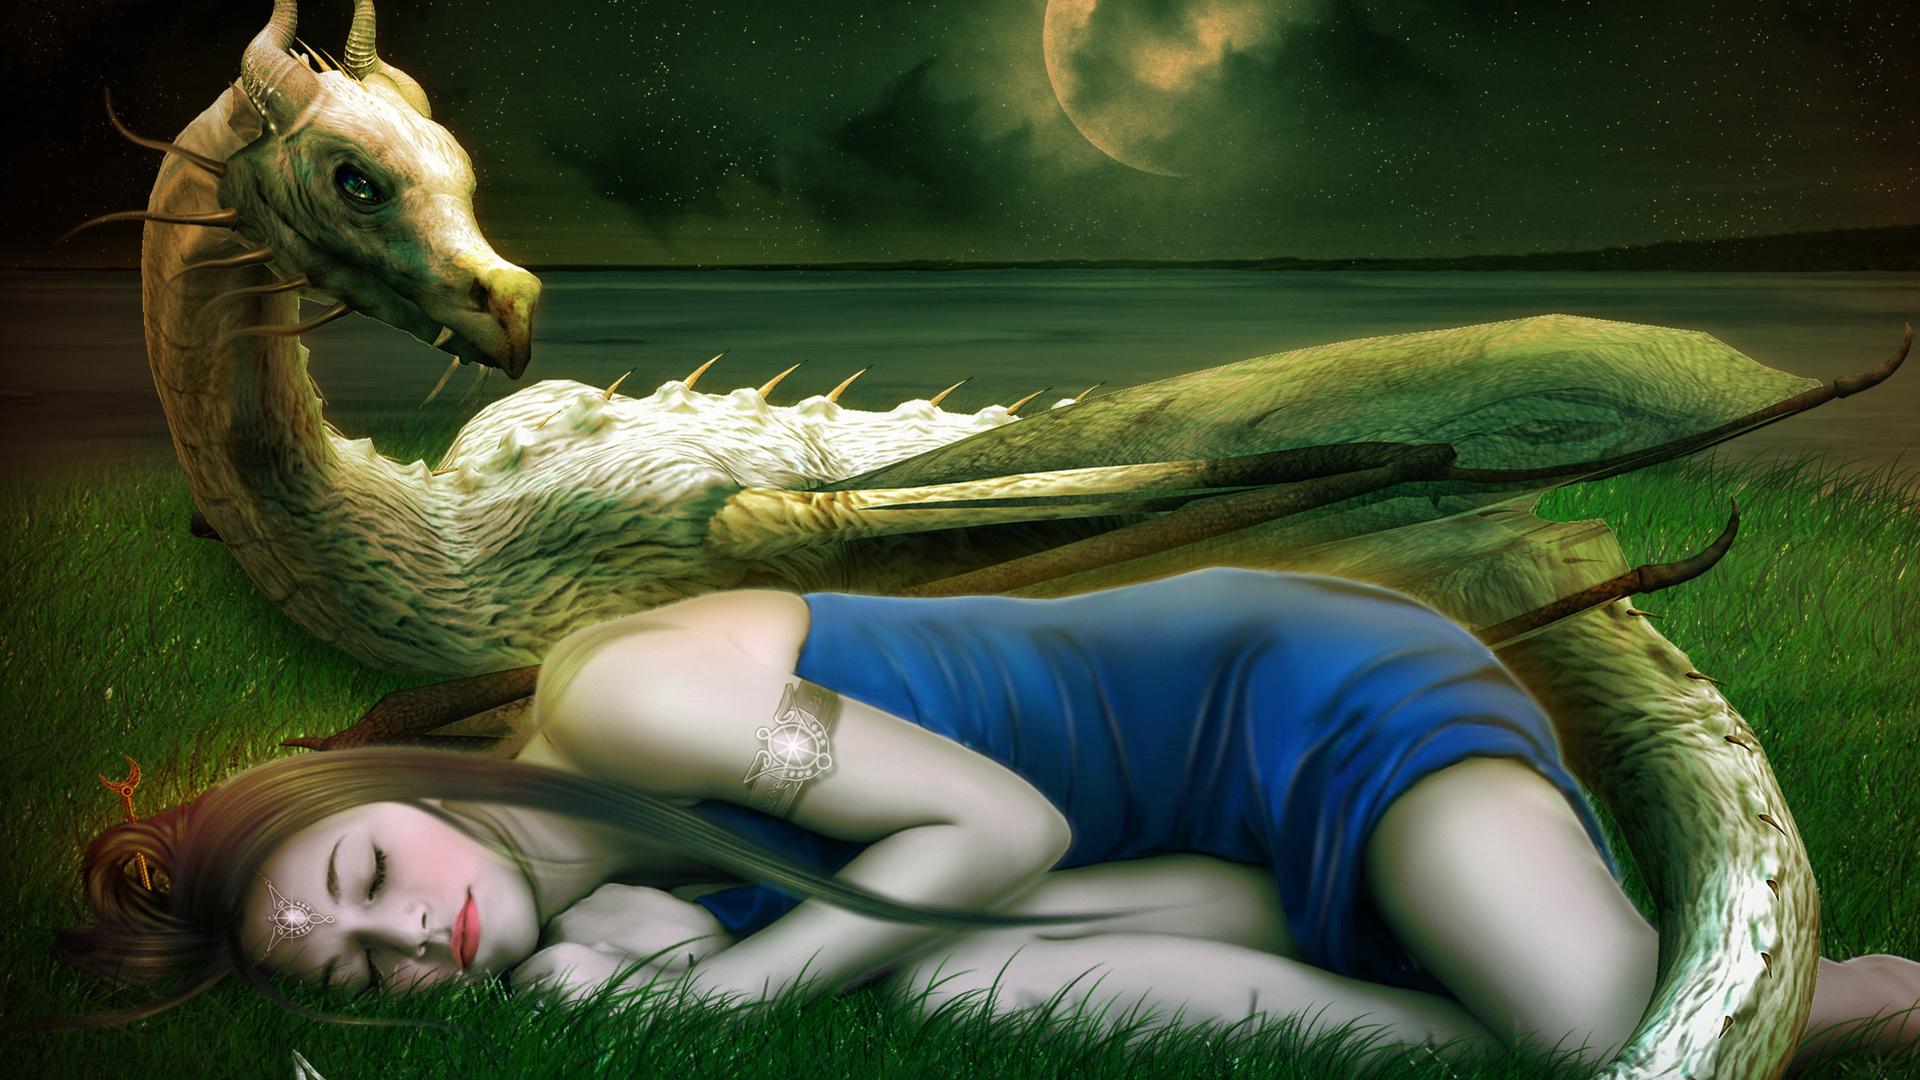 сон, лицо, украшения, девушка, арт, спит, Фантастика